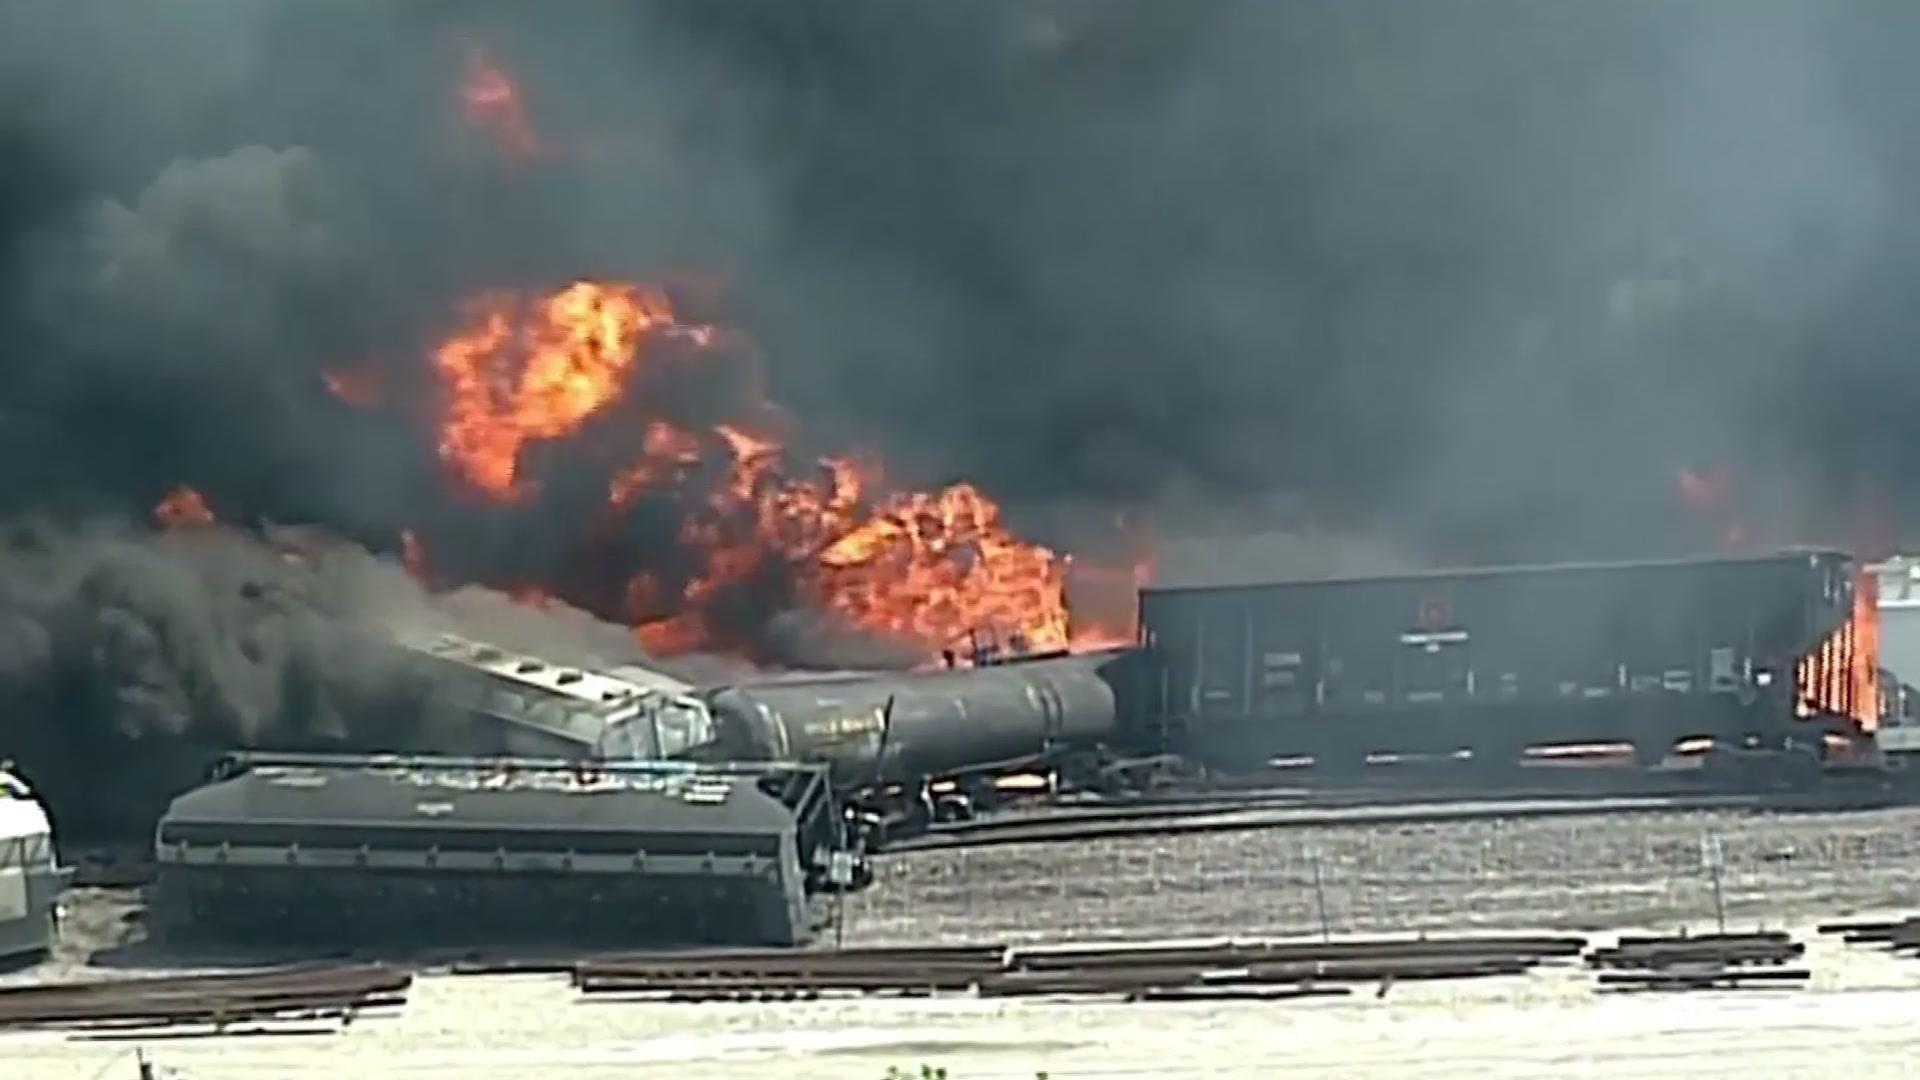 Schools, homes evacuated after train derailment